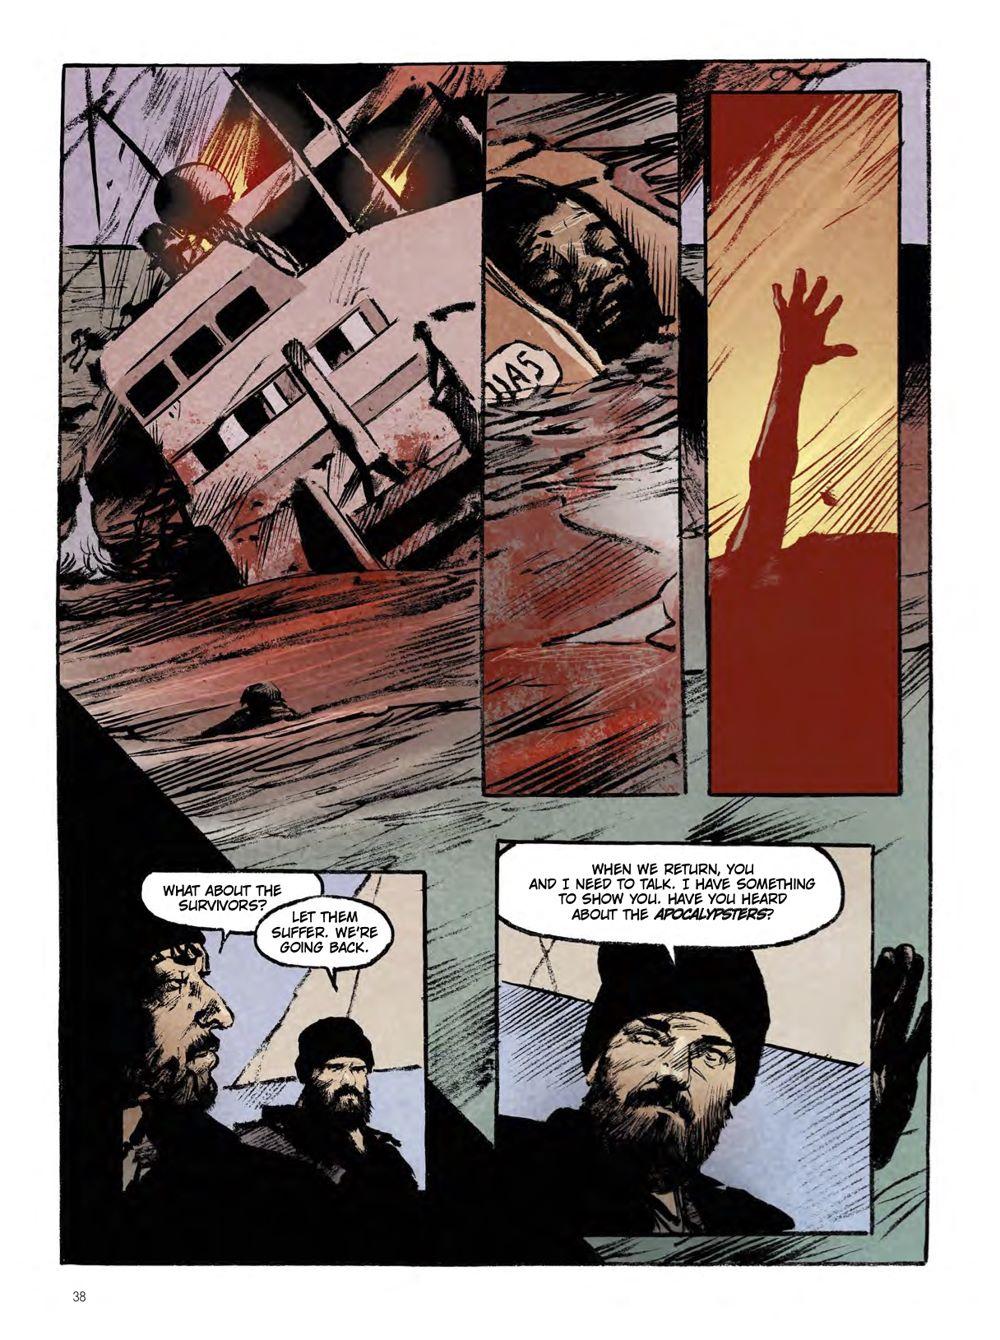 snowpiercer_the_prequel-extinction-3 ComicList Previews: SNOWPIERCER PREQUEL VOLUME 1 EXTINCTION GN